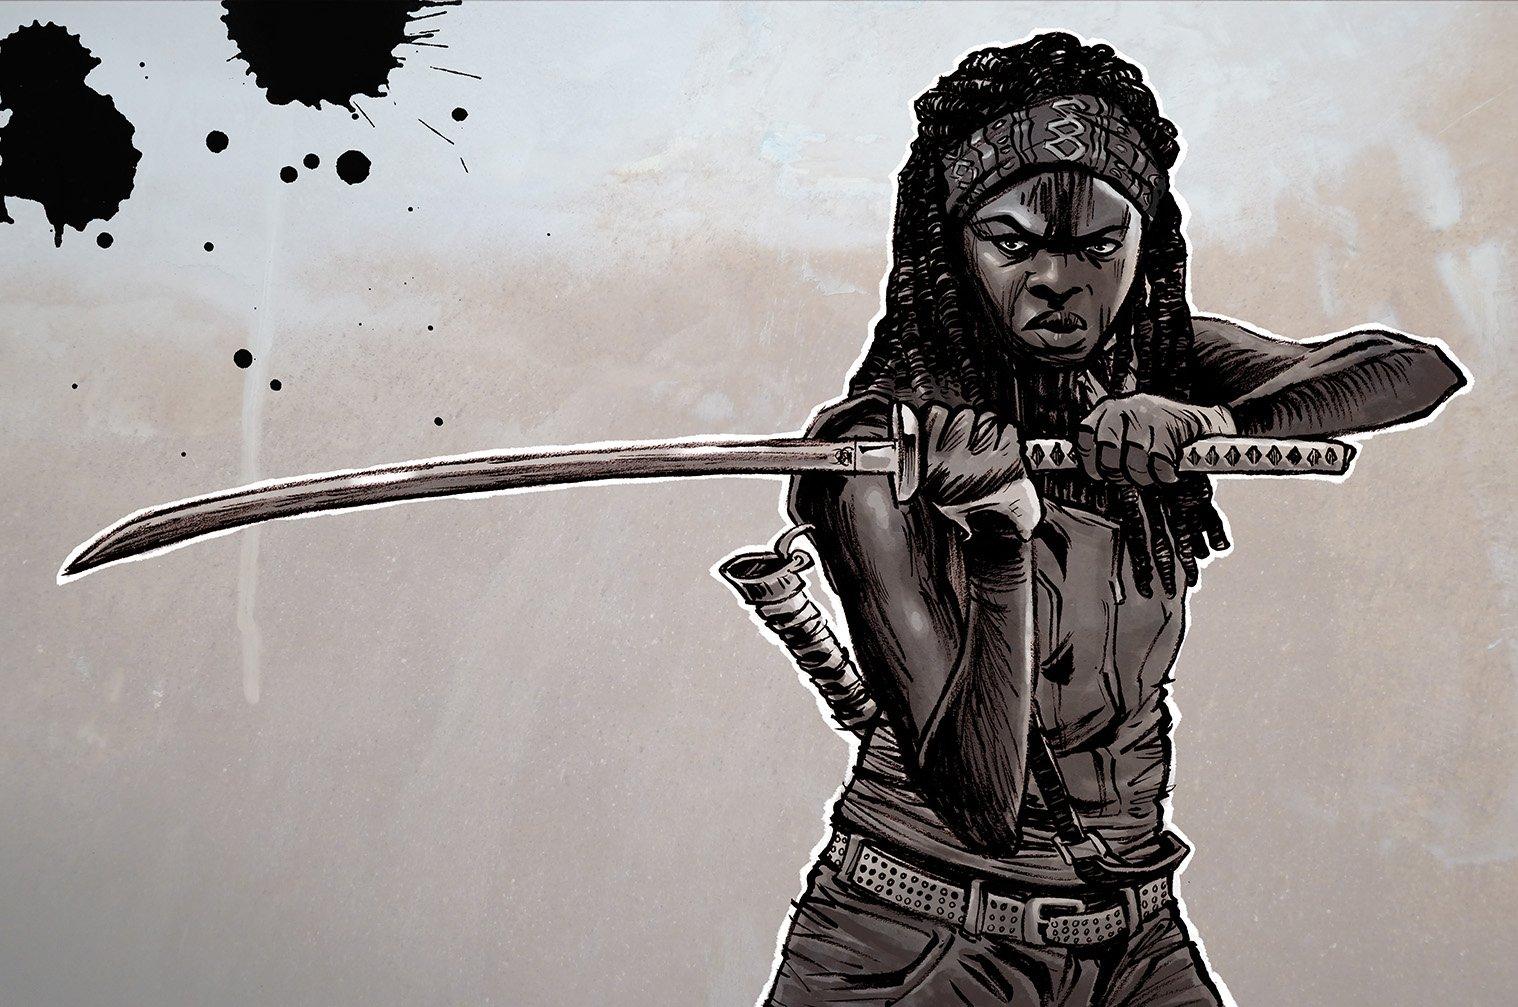 """The Walking Dead: Michonne"". Стоит ли игра свеч? - Изображение 1"